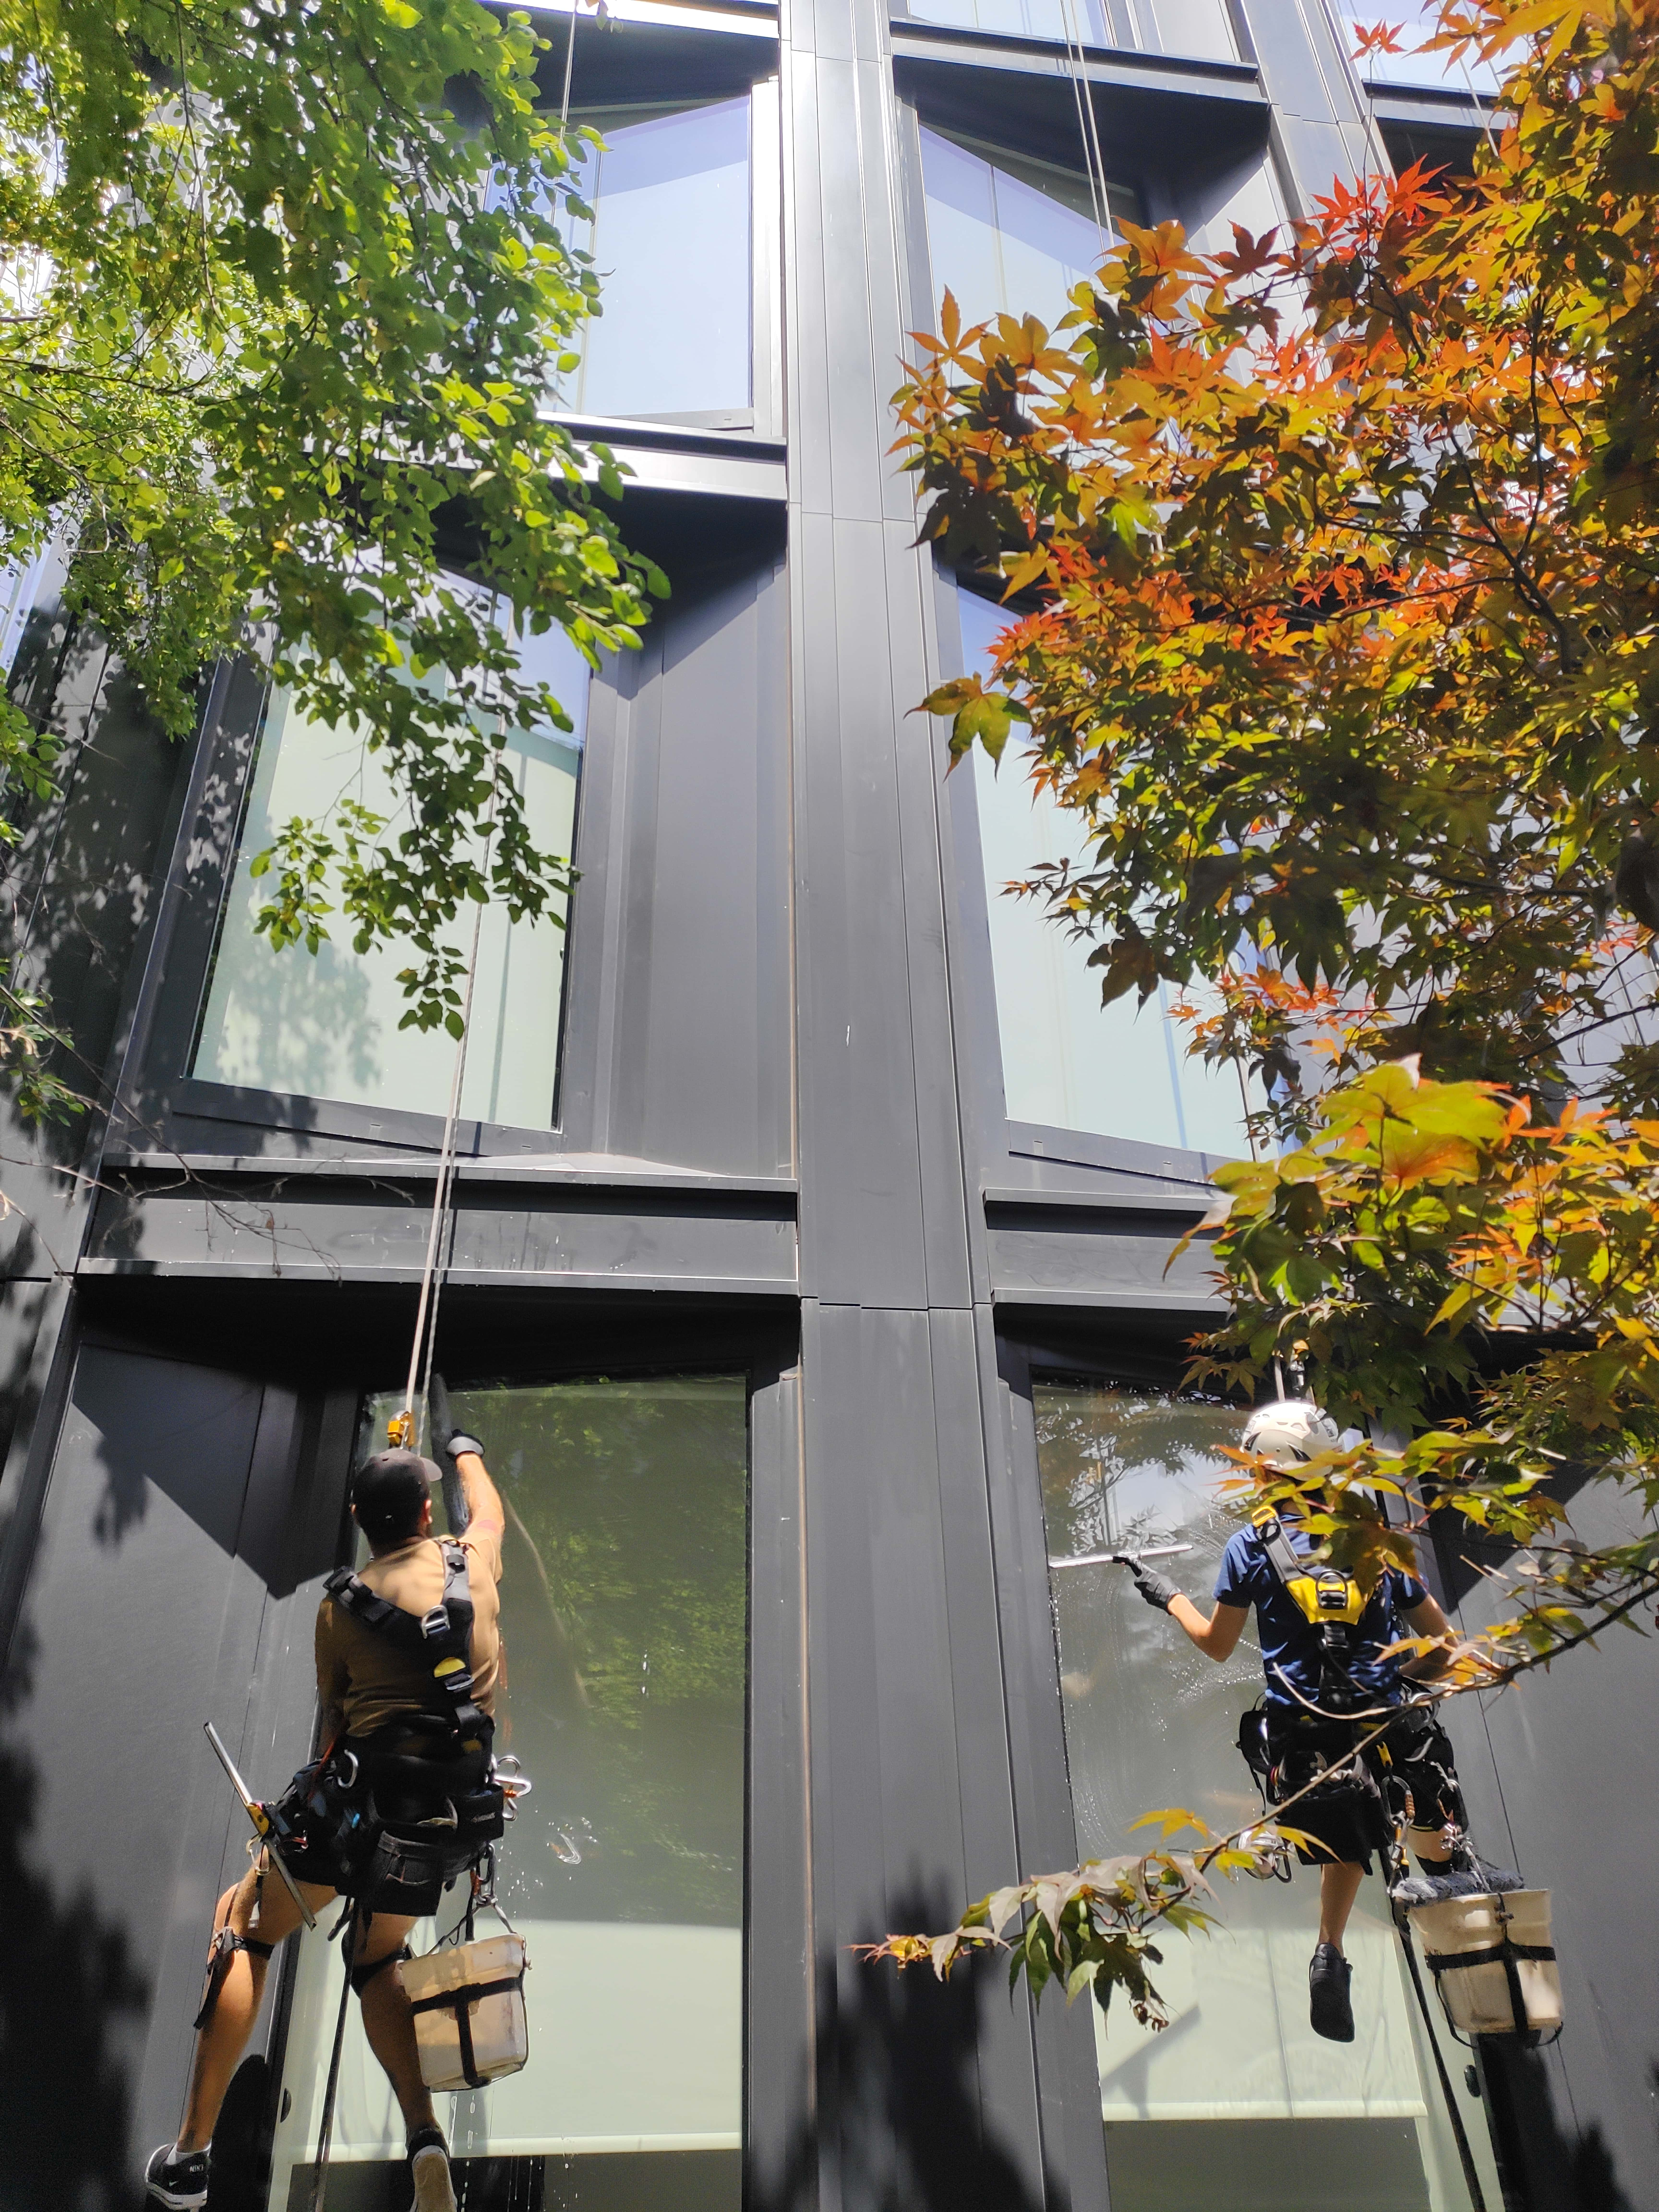 Windows washing in 505 West 19th, New York